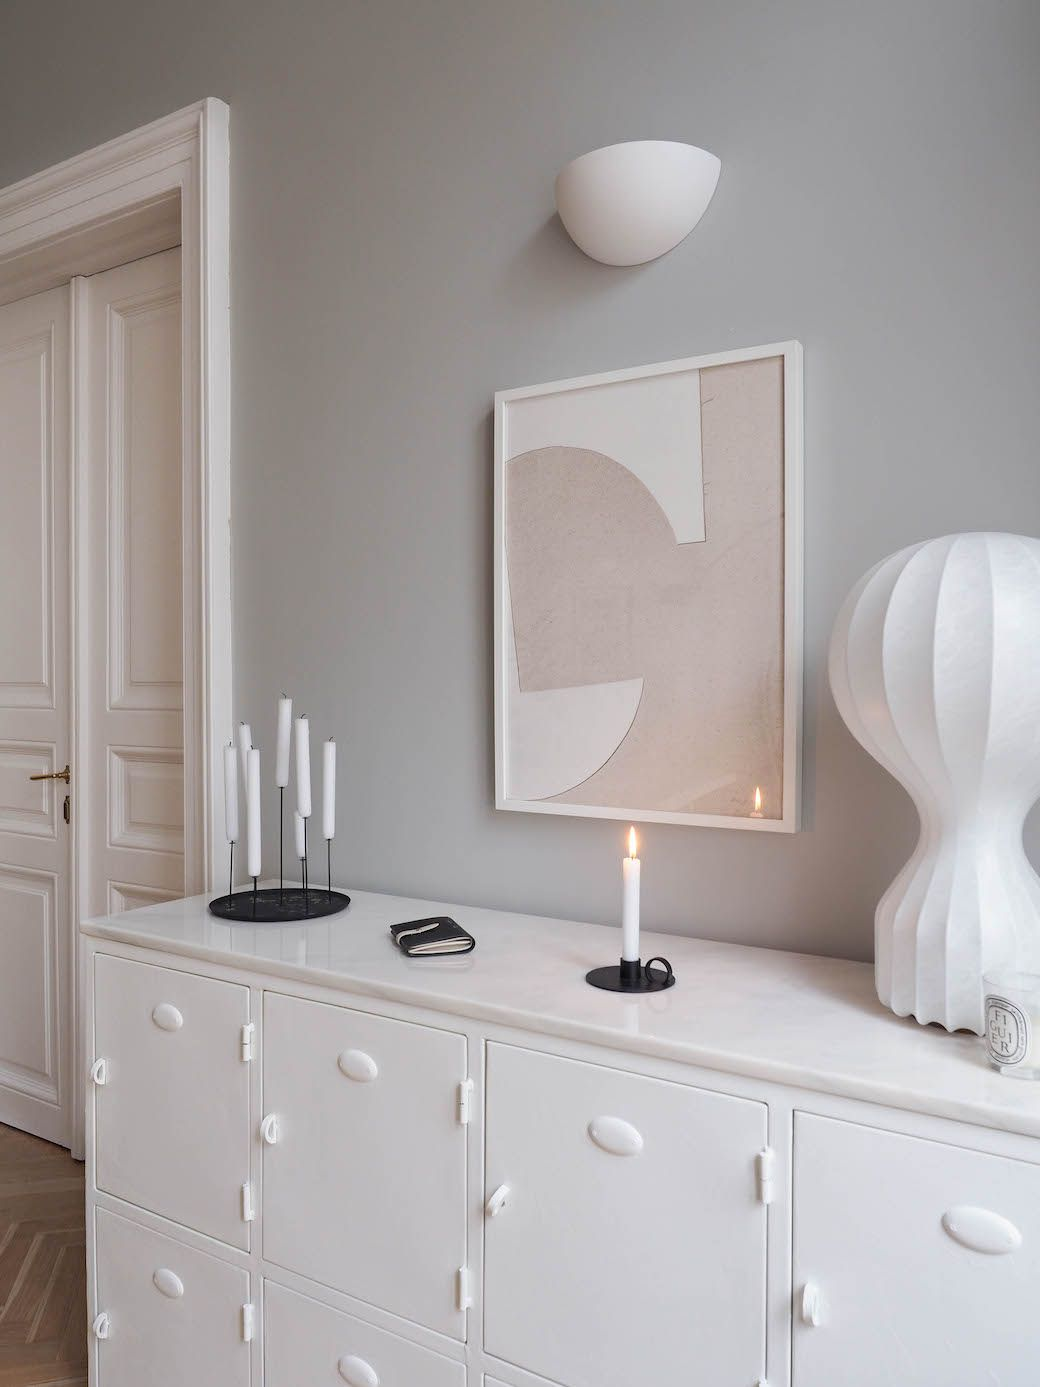 Home Story Svenja Traumzuhause in 2019 Graue wände